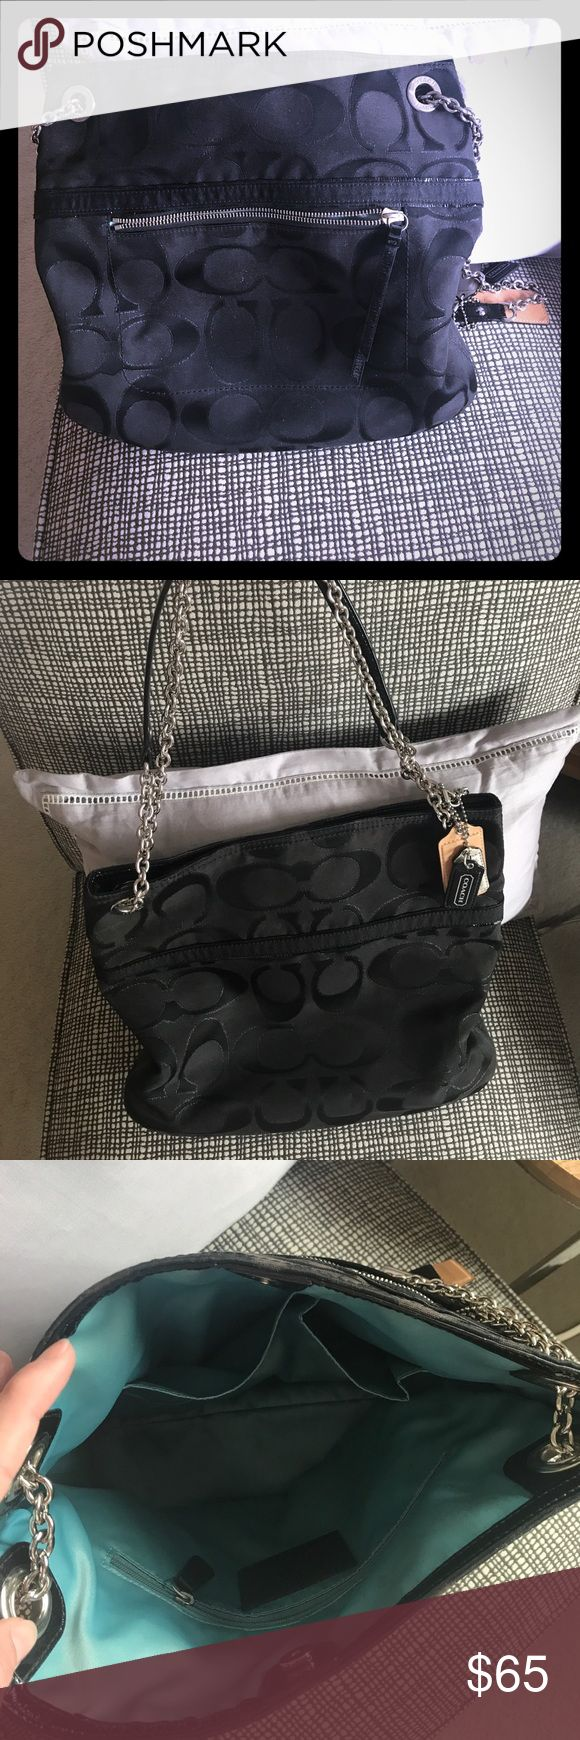 Black coach purse. Black coach purse. Gently used. Coach Bags Shoulder Bags